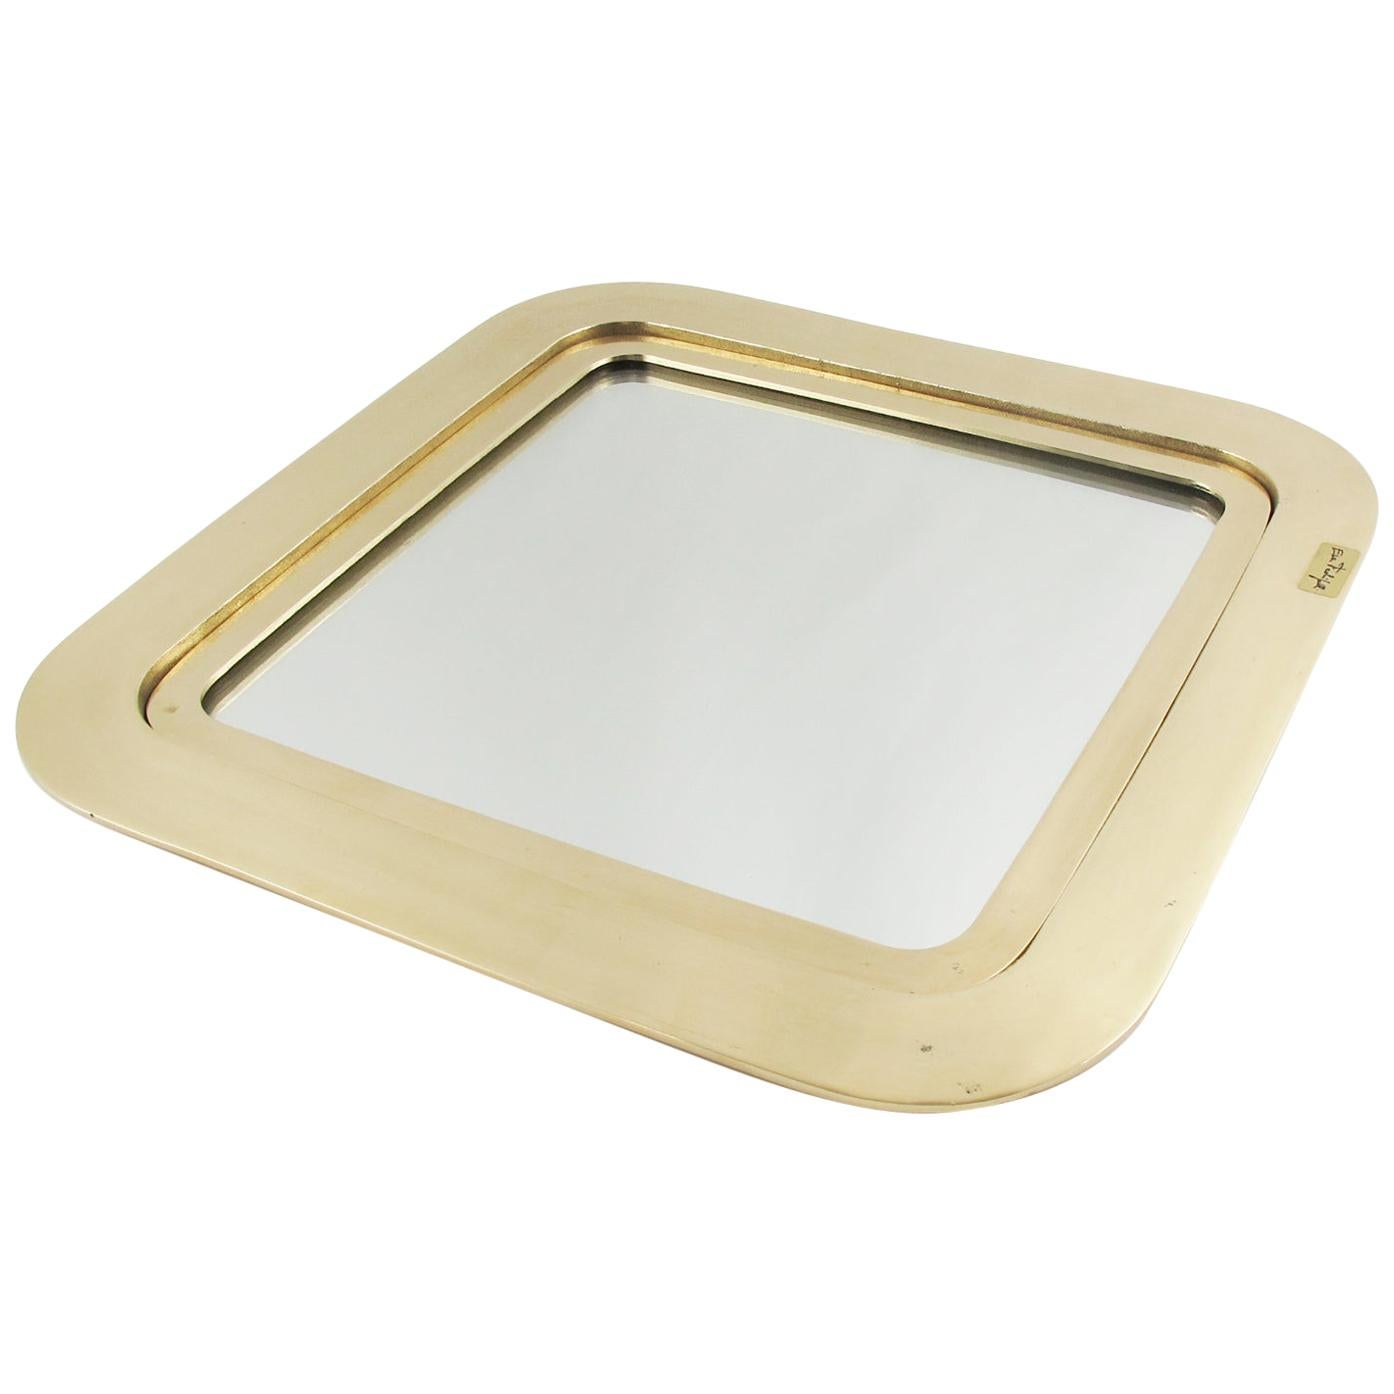 Italian Esa Fedrigolli Gilded Bronze Tray Platter